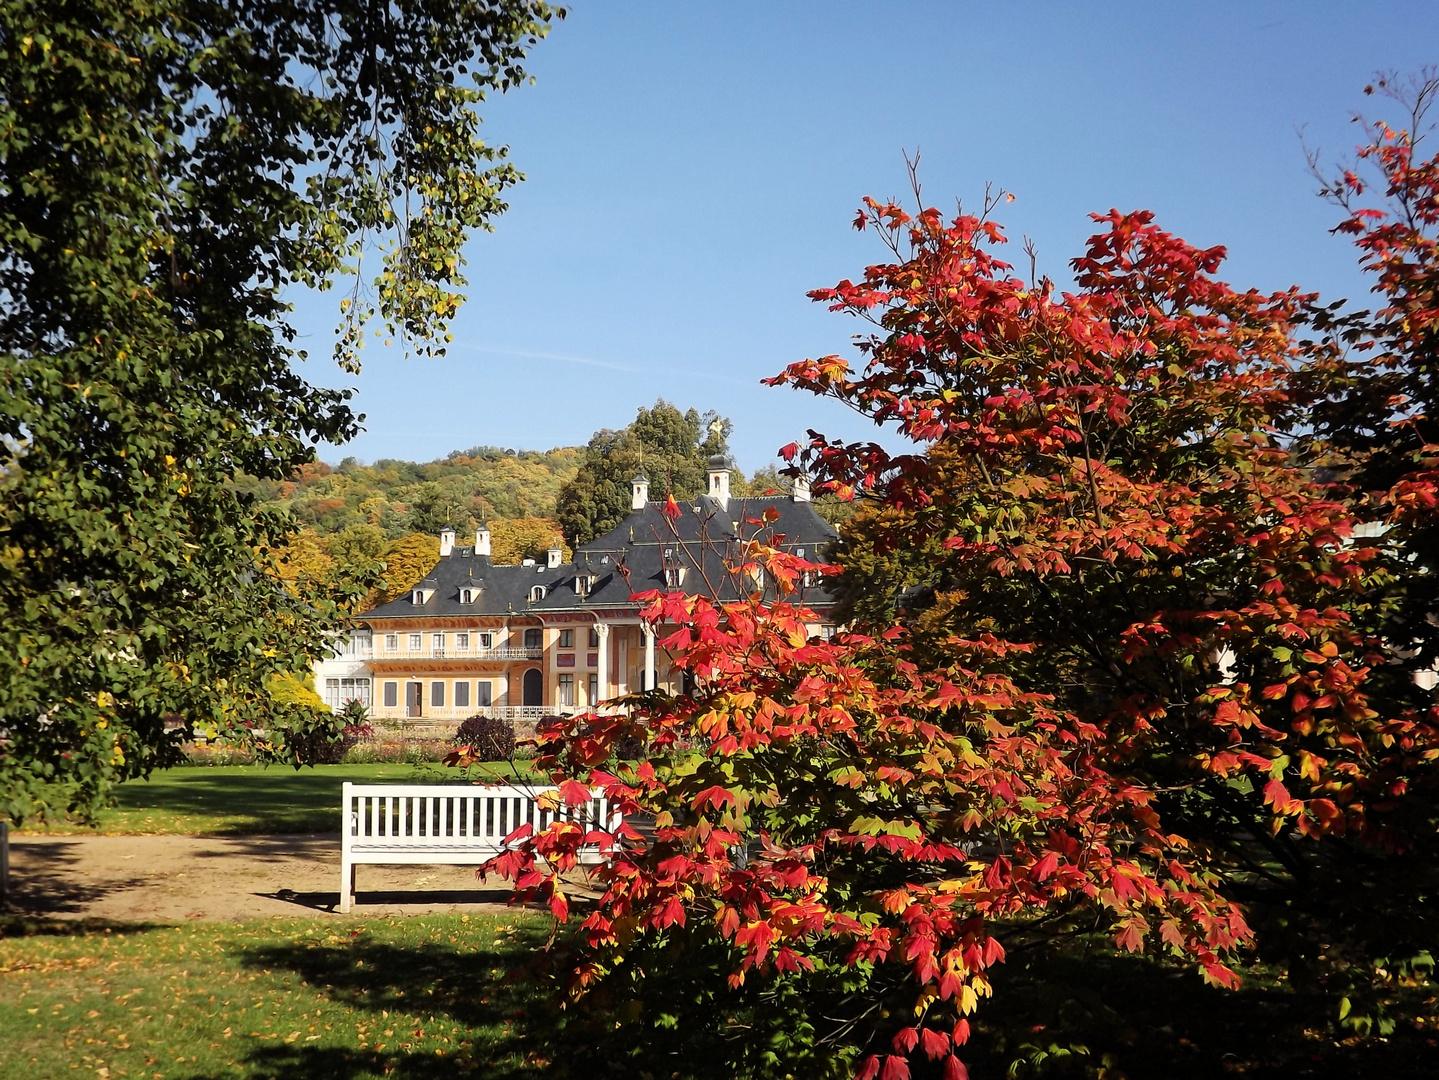 Herbst in Pillnitz